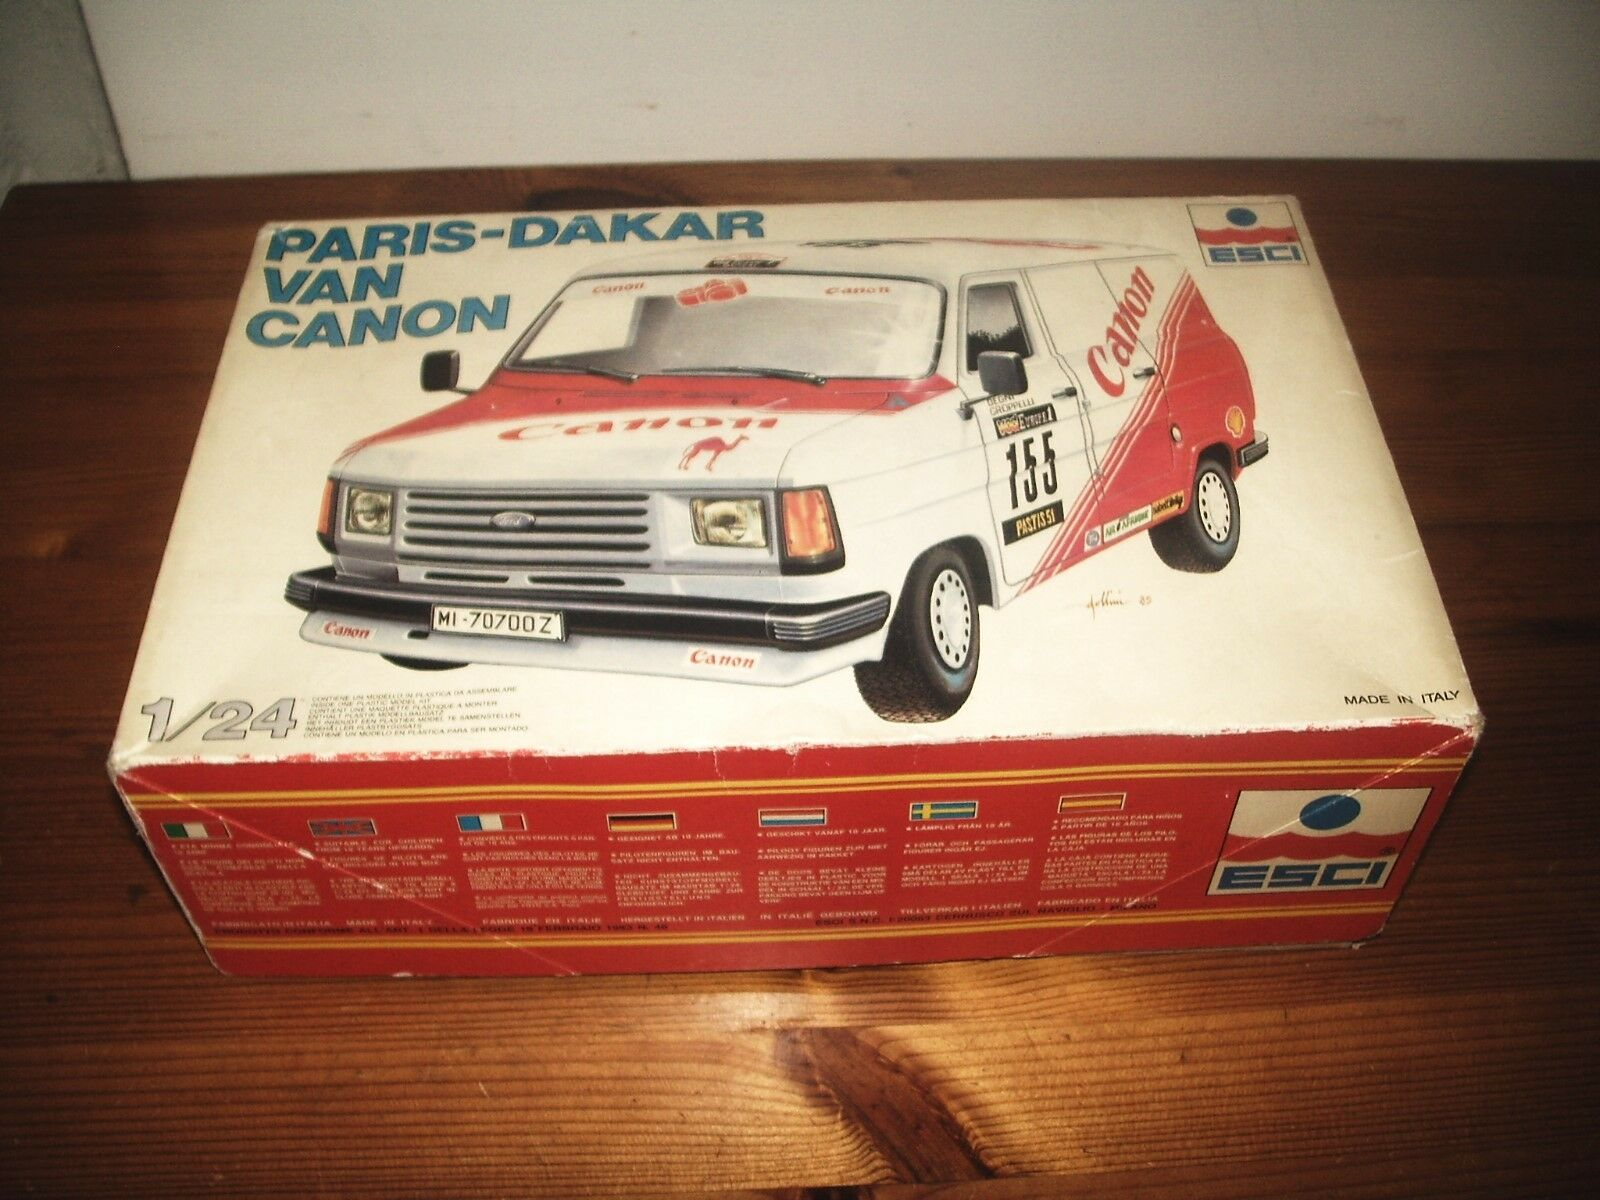 ESCI 1 24 PARIS-DAKAR TRANSIT VAN CANON MODEL KIT 1982